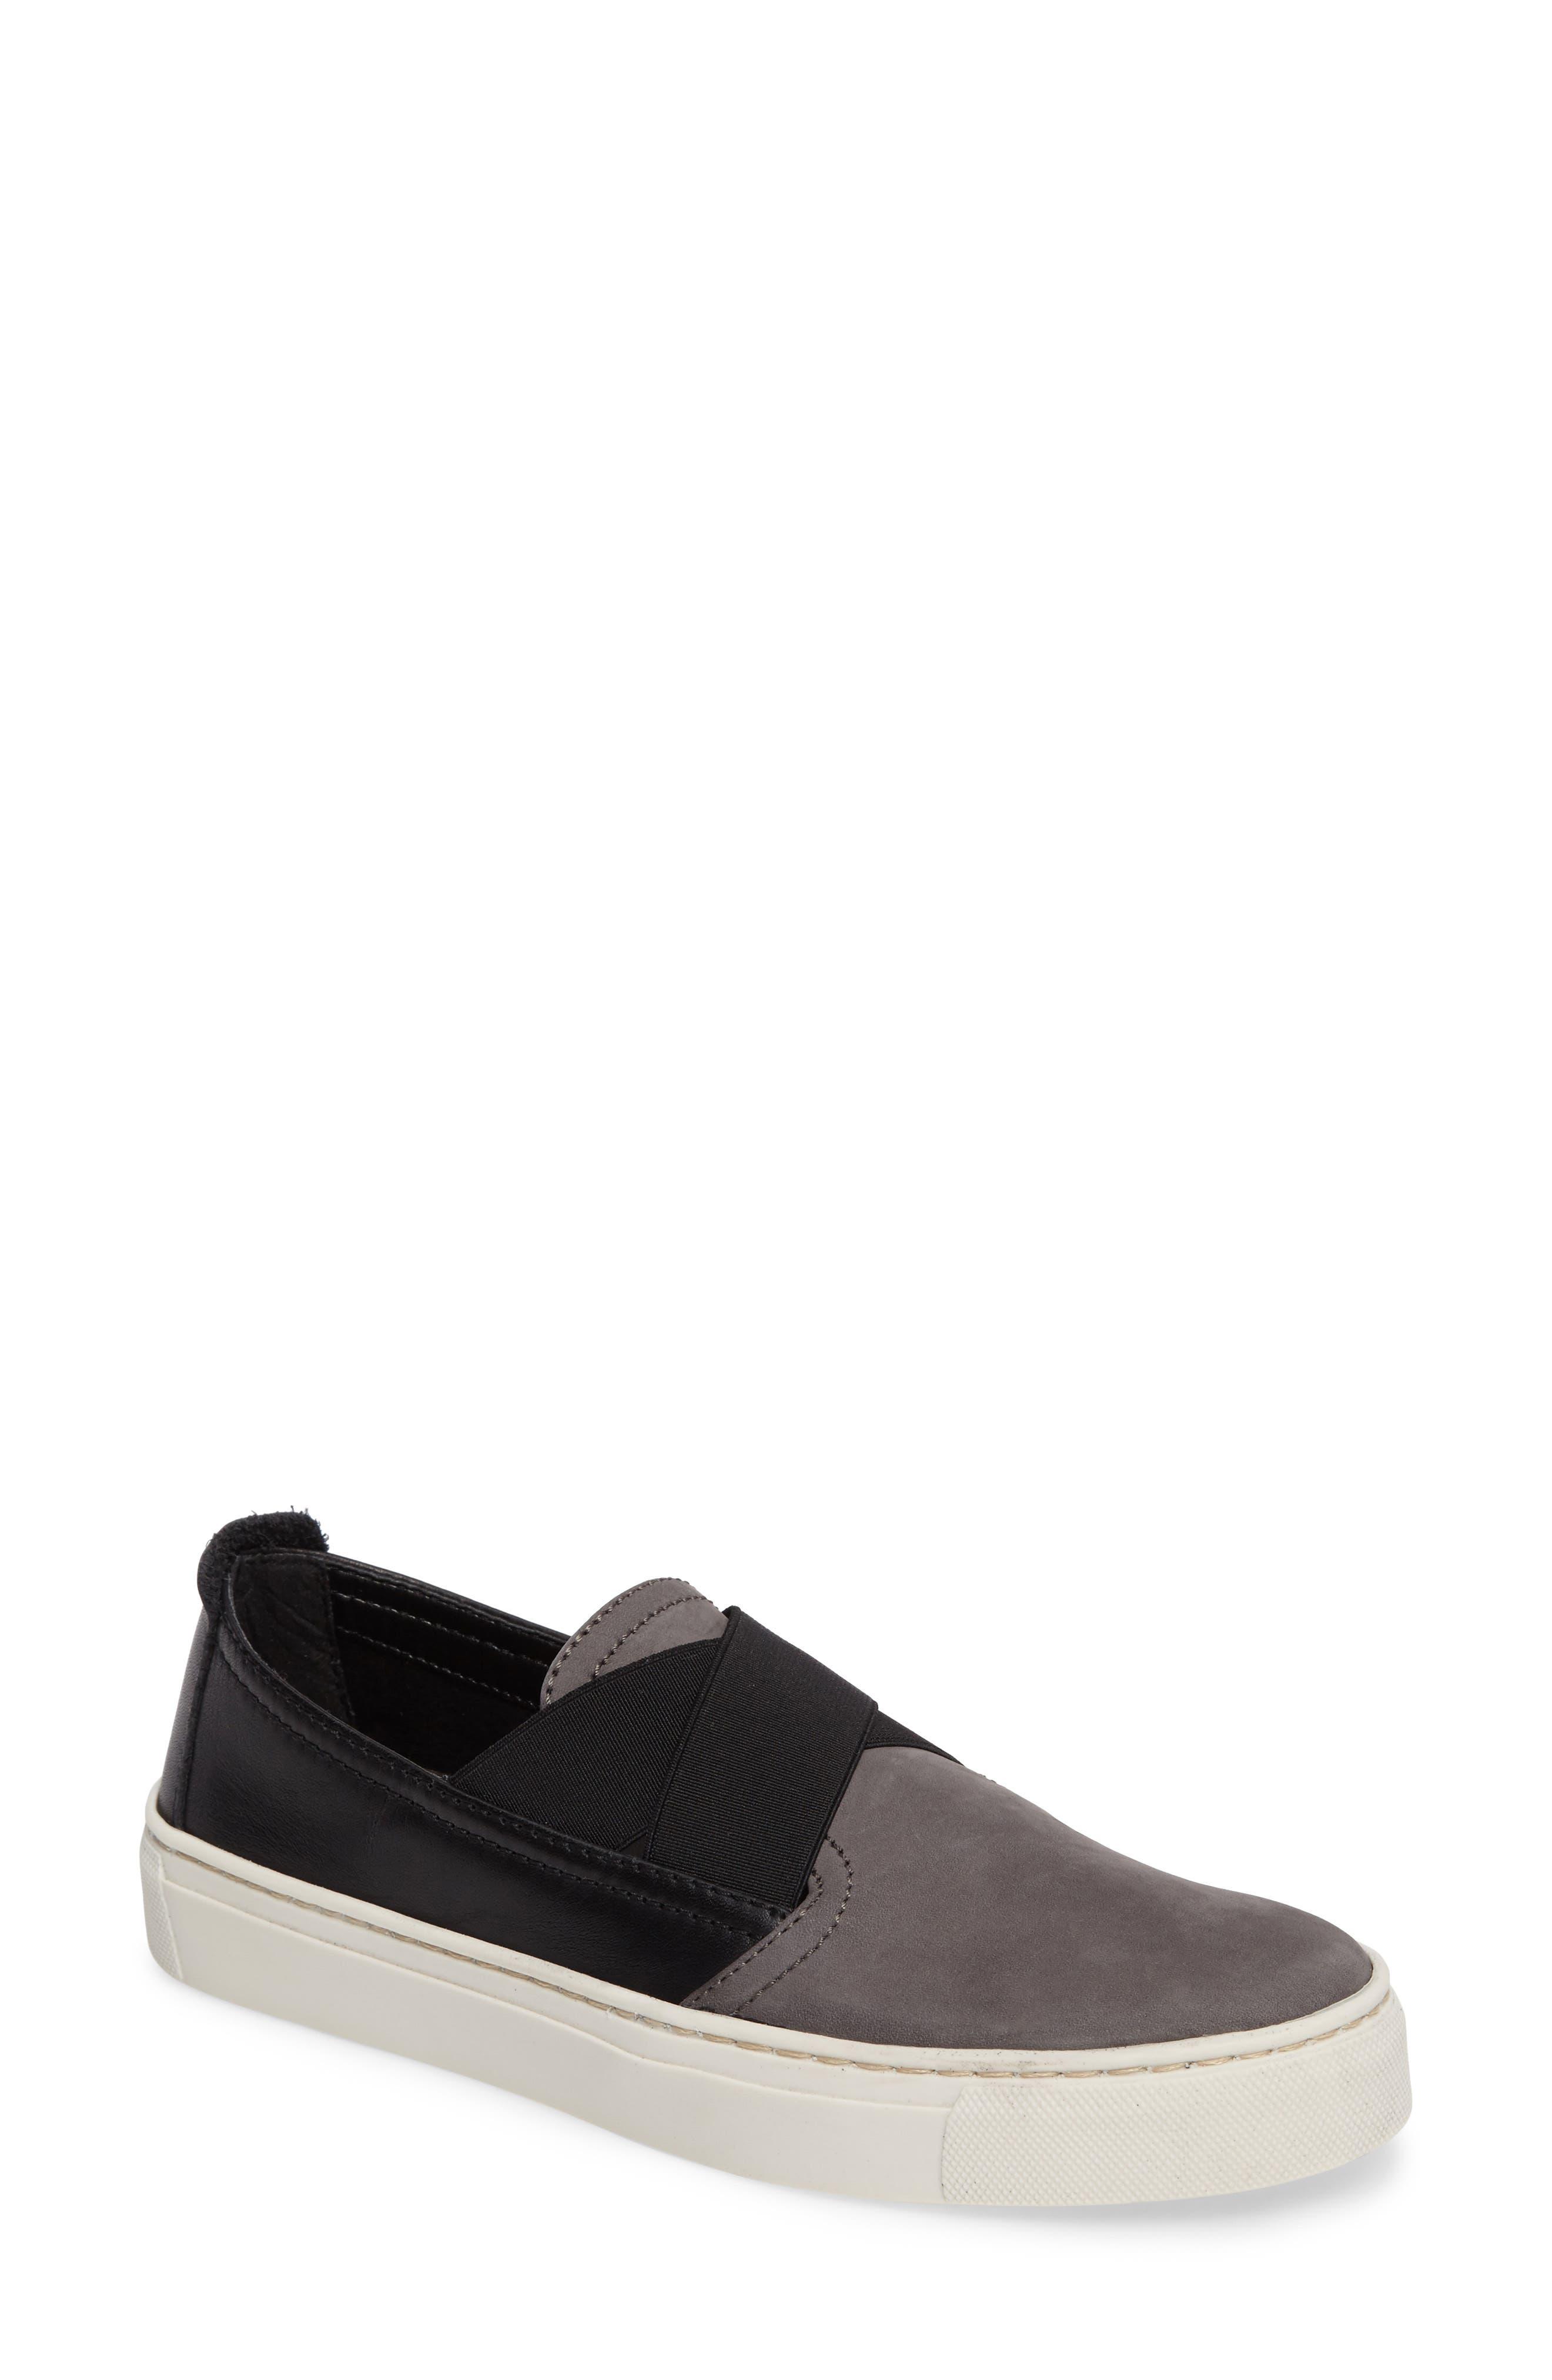 La Cross Slip-On Sneaker,                             Main thumbnail 1, color,                             001